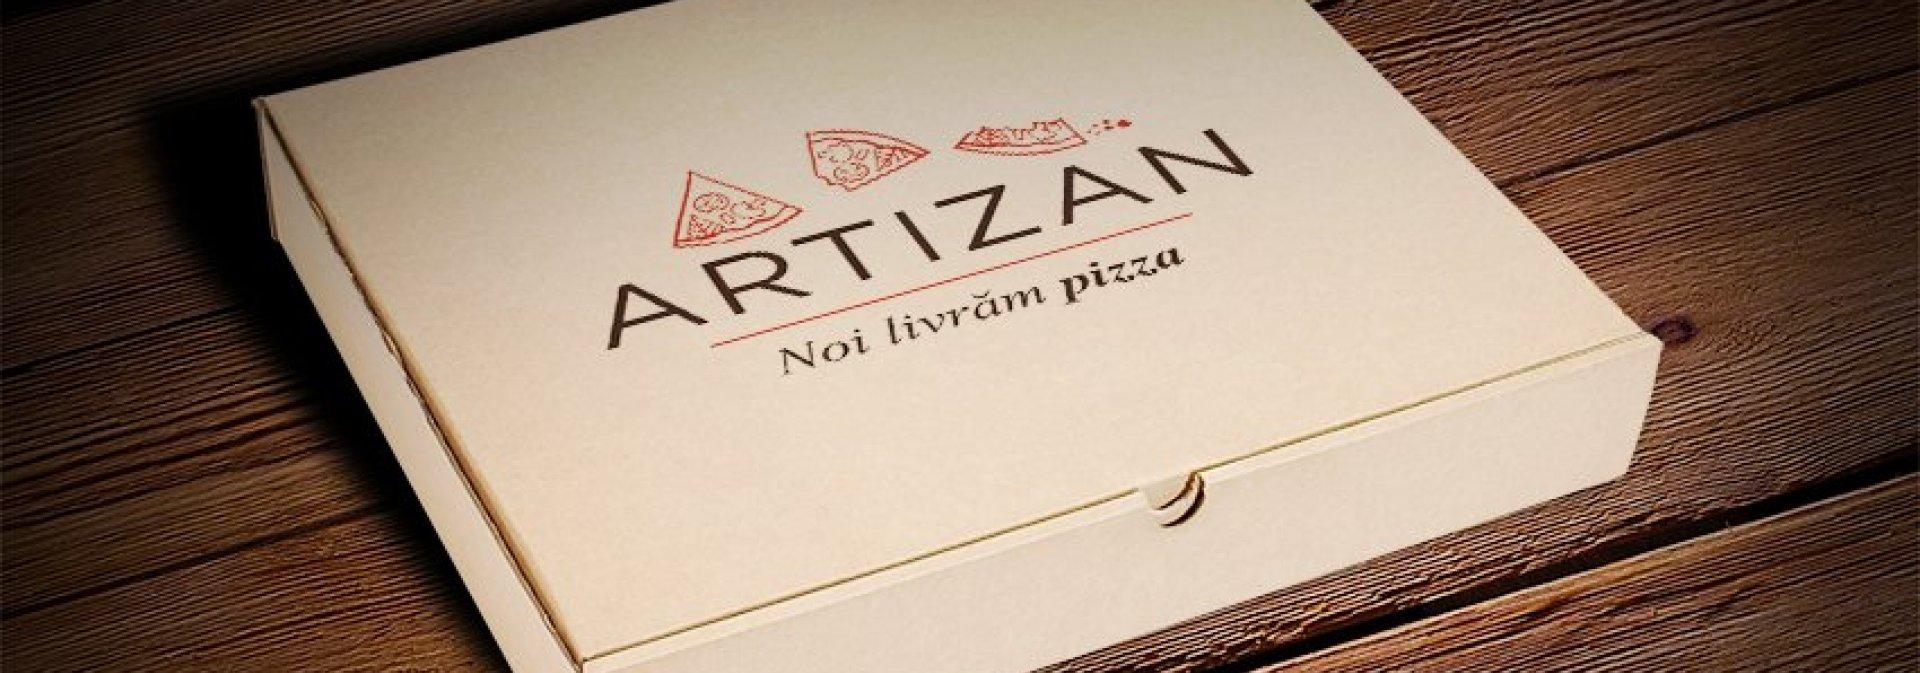 Artizan Pizza, Cluj-Napoca, Cluj